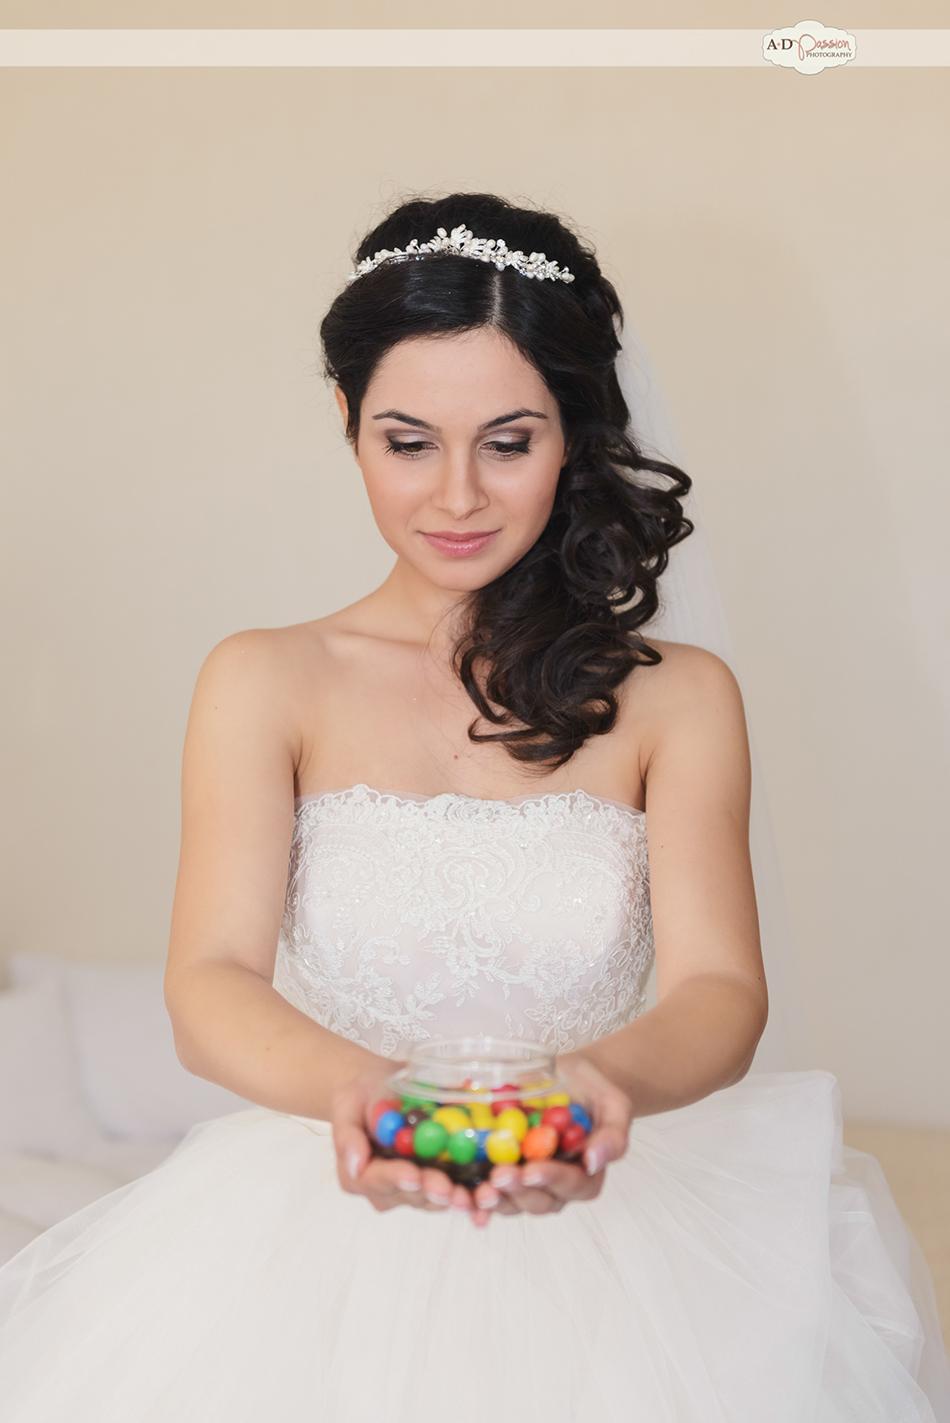 AD Passion Photography | fotograf-profesionist-de-nunta-arad-timisoara-bucuresti_madalina+mihnea_0037 | Adelin, Dida, fotograf profesionist, fotograf de nunta, fotografie de nunta, fotograf Timisoara, fotograf Craiova, fotograf Bucuresti, fotograf Arad, nunta Timisoara, nunta Arad, nunta Bucuresti, nunta Craiova